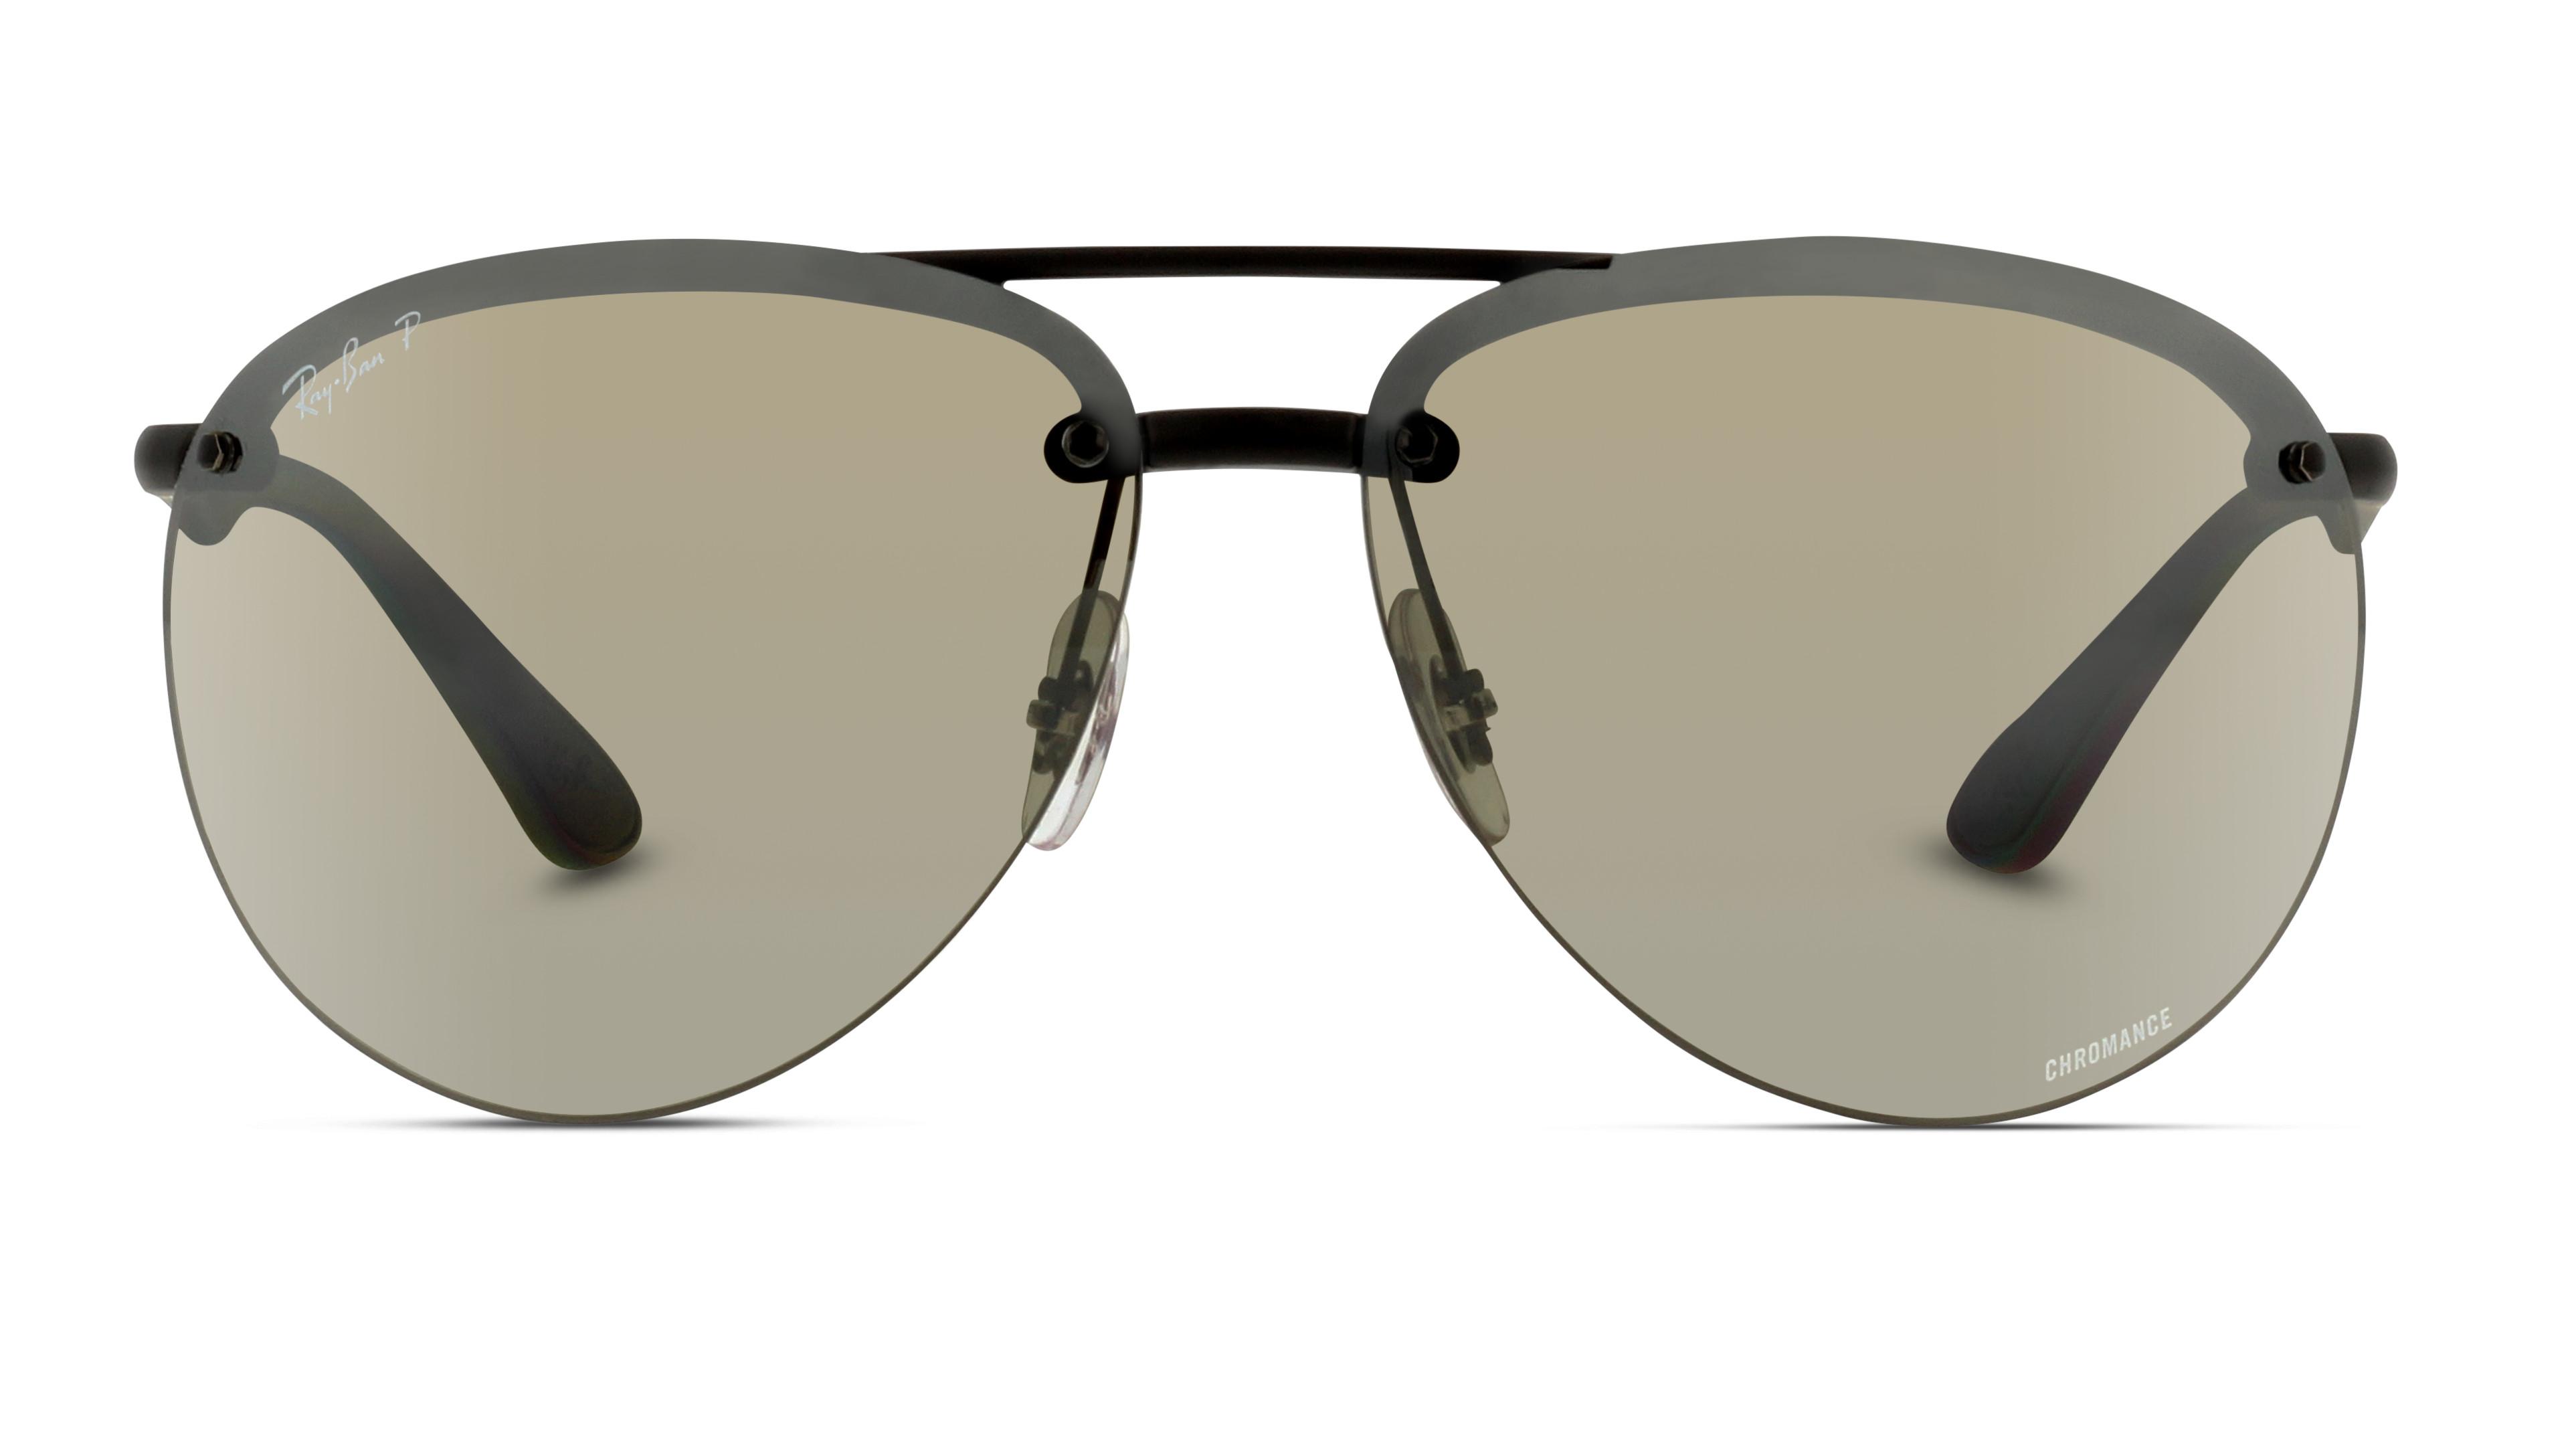 8053672839319-front-01-ray-ban-rb4293ch-eyewear-matte-black